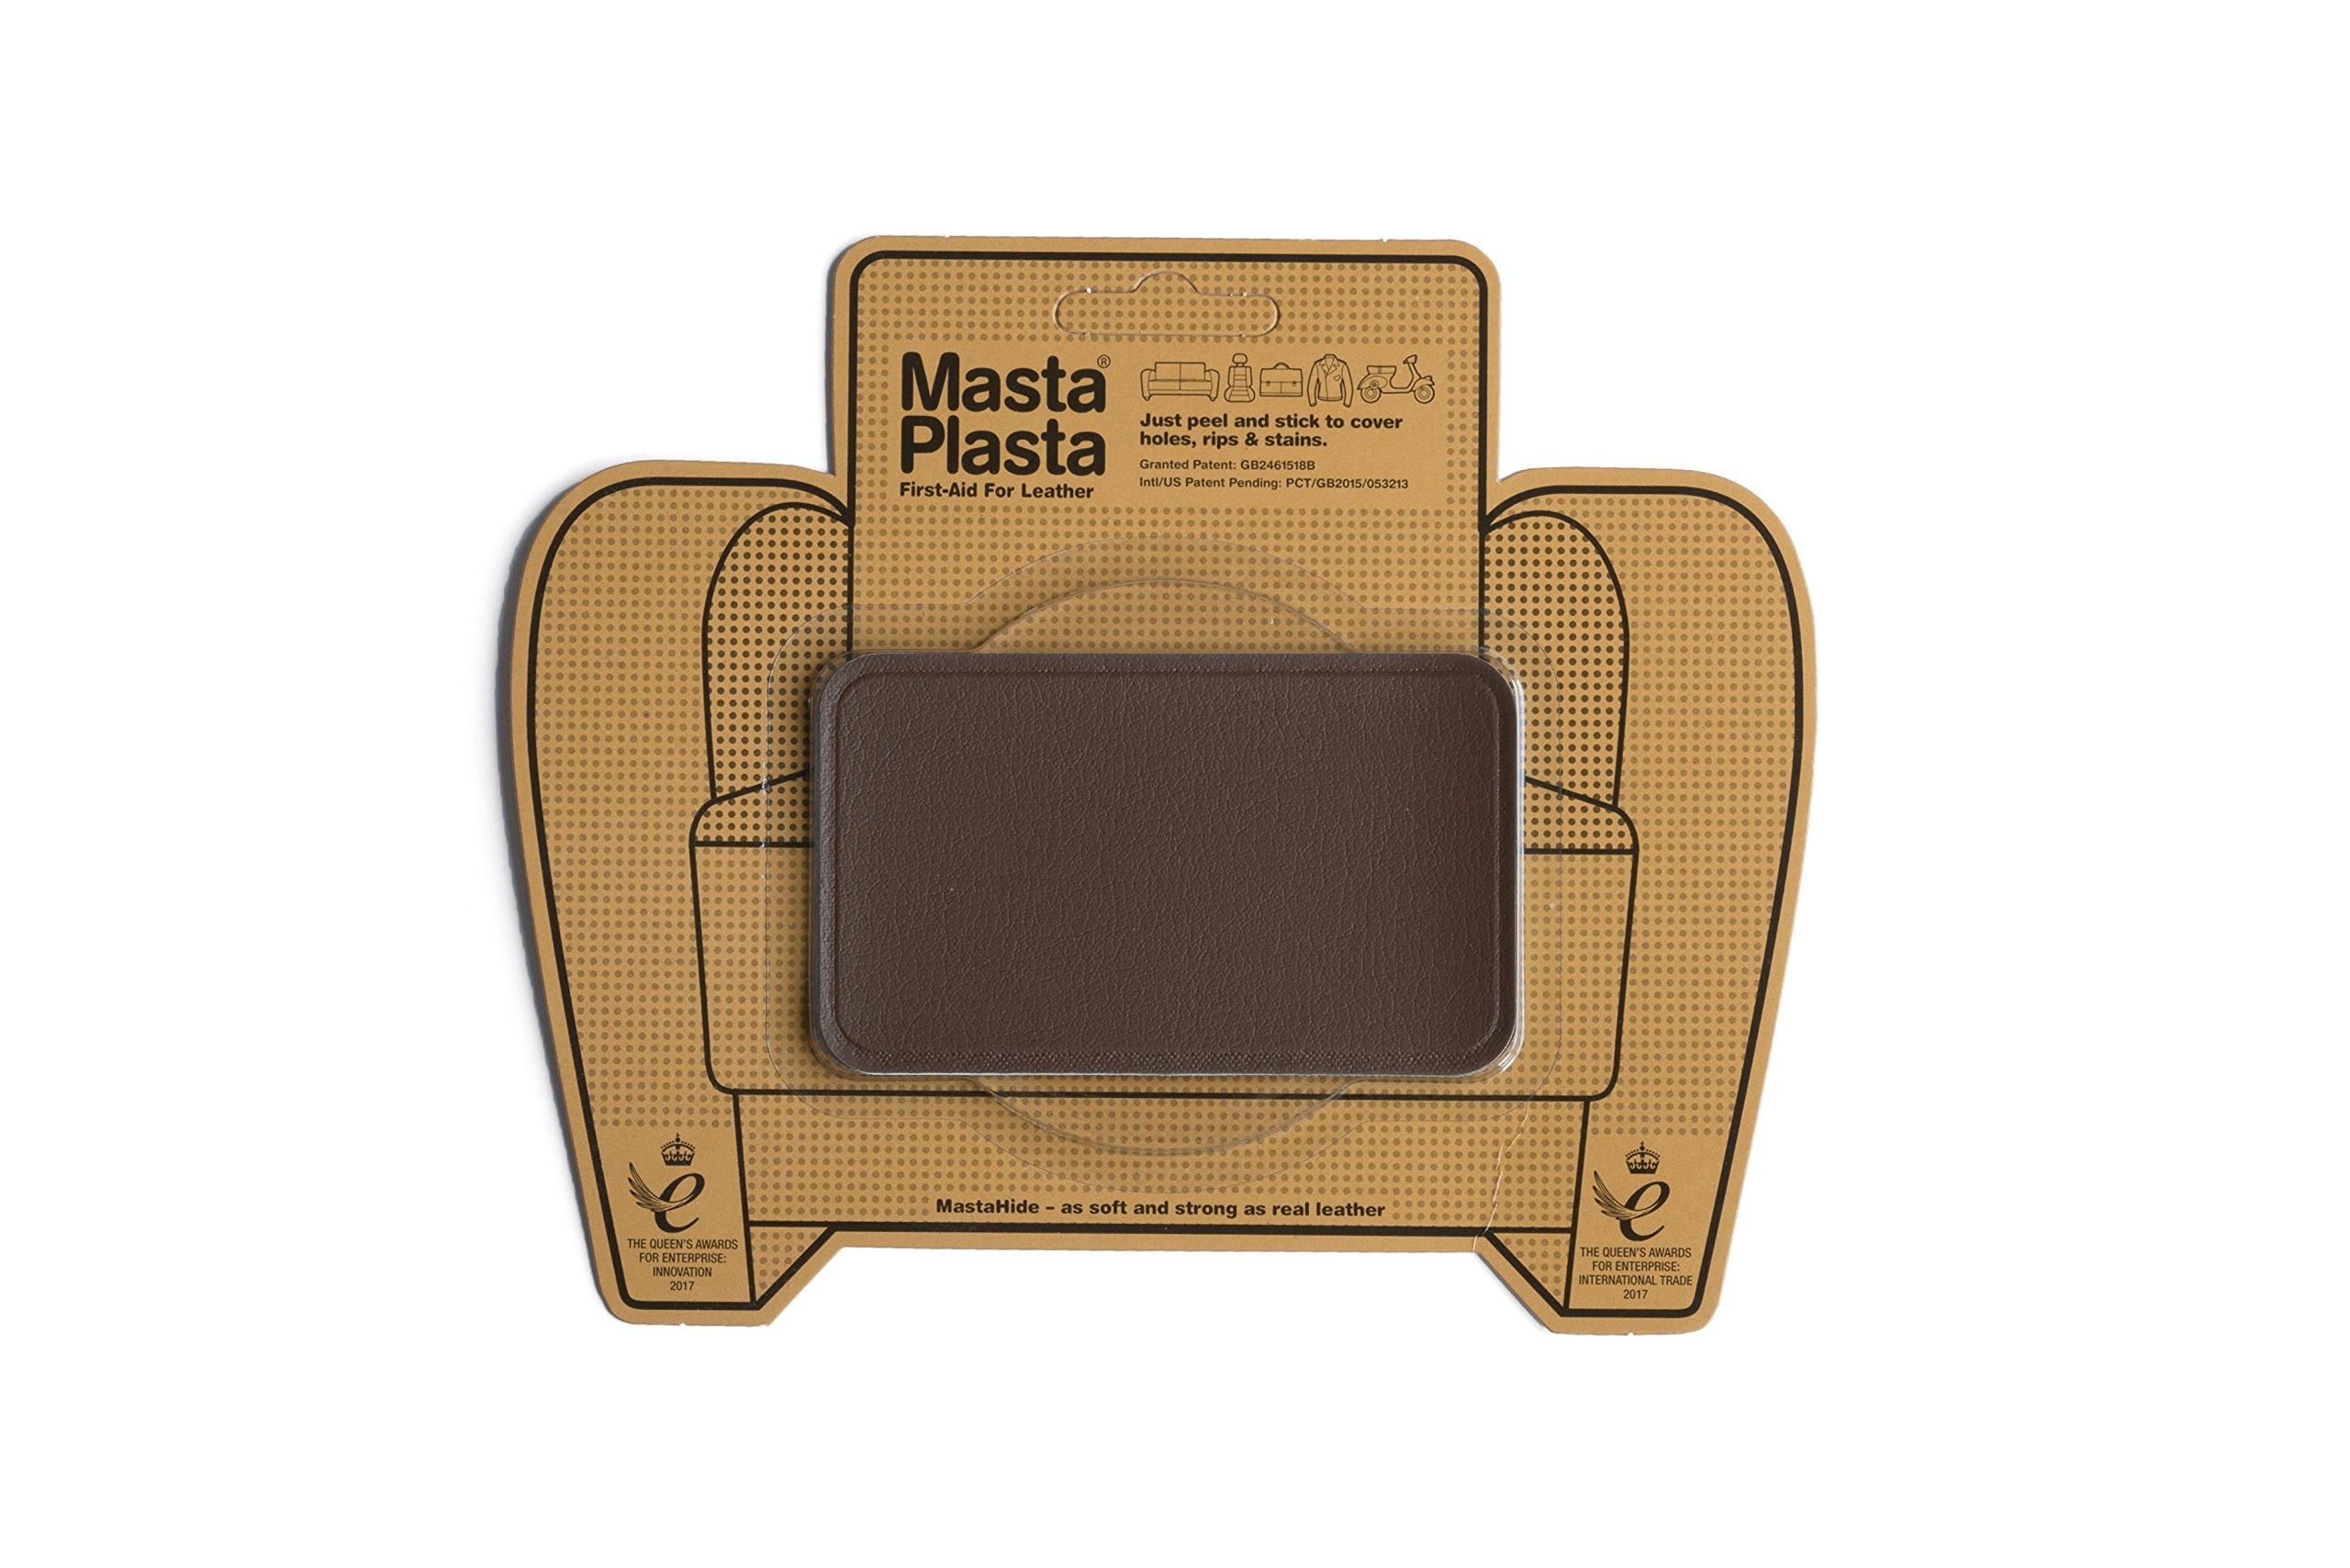 MastaPlasta, Leather Repair Patch, First-Aid for Sofas, Car Seats, Handbags, Jackets, Plain, Mid Brown Medium Stitch 4''x2.4''